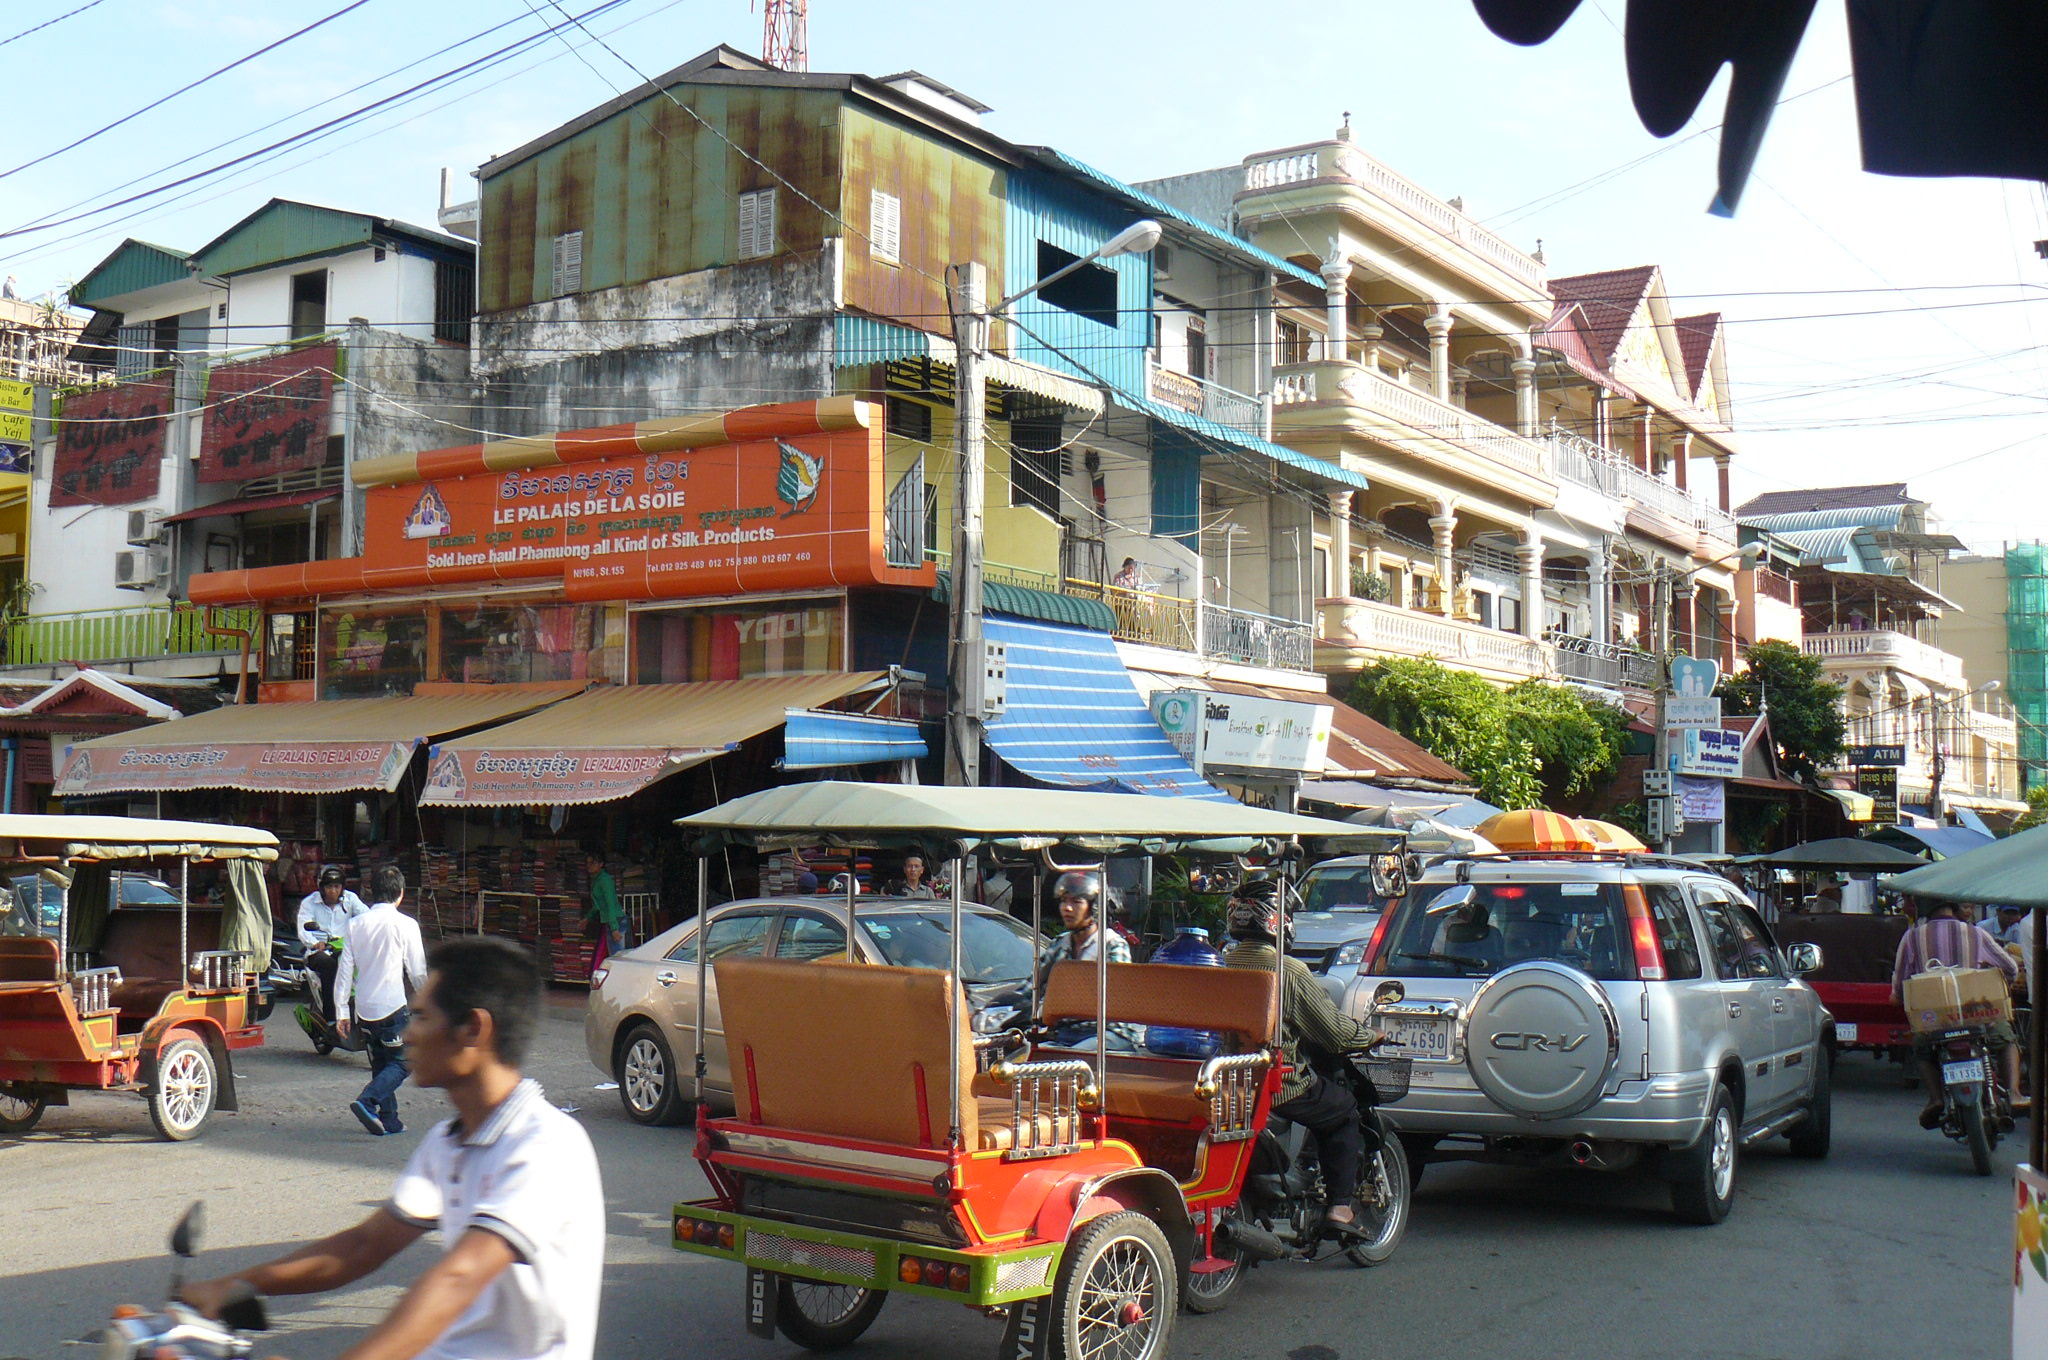 Kambodscha, Phnom Penh - Lena verfährt sich mit den Tuc Tuc